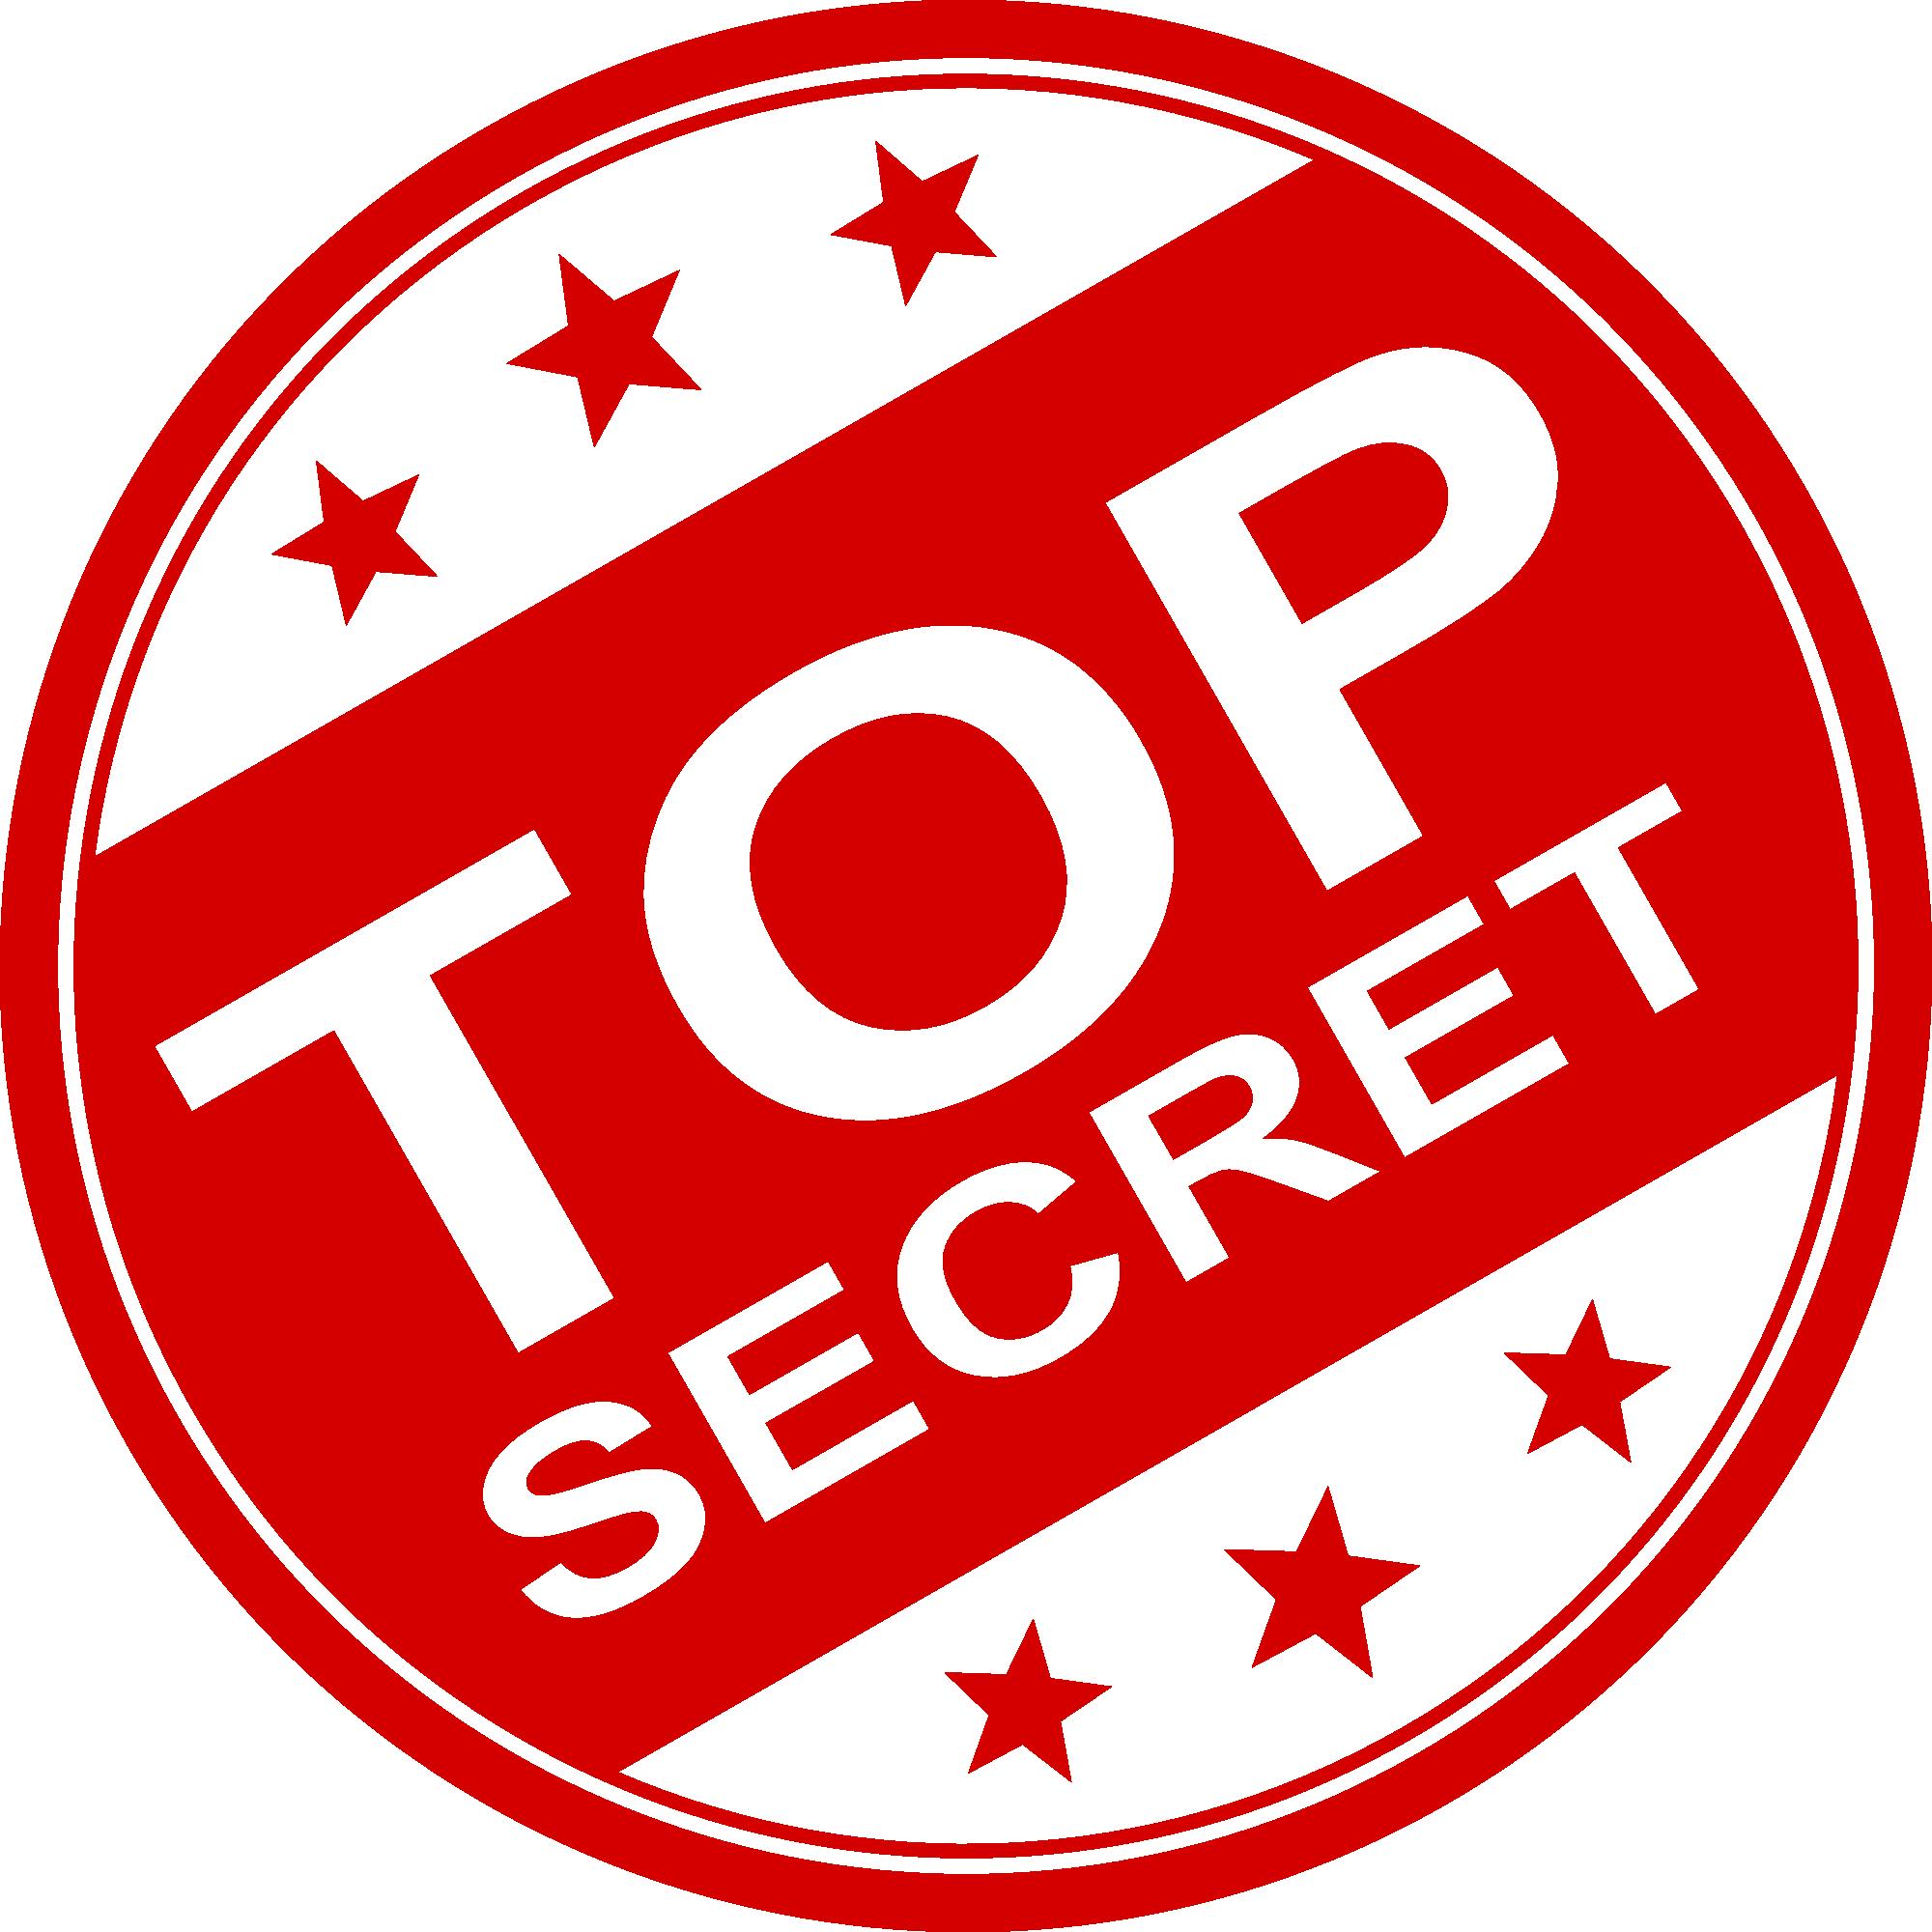 Free Download Top Secret Stamp 1